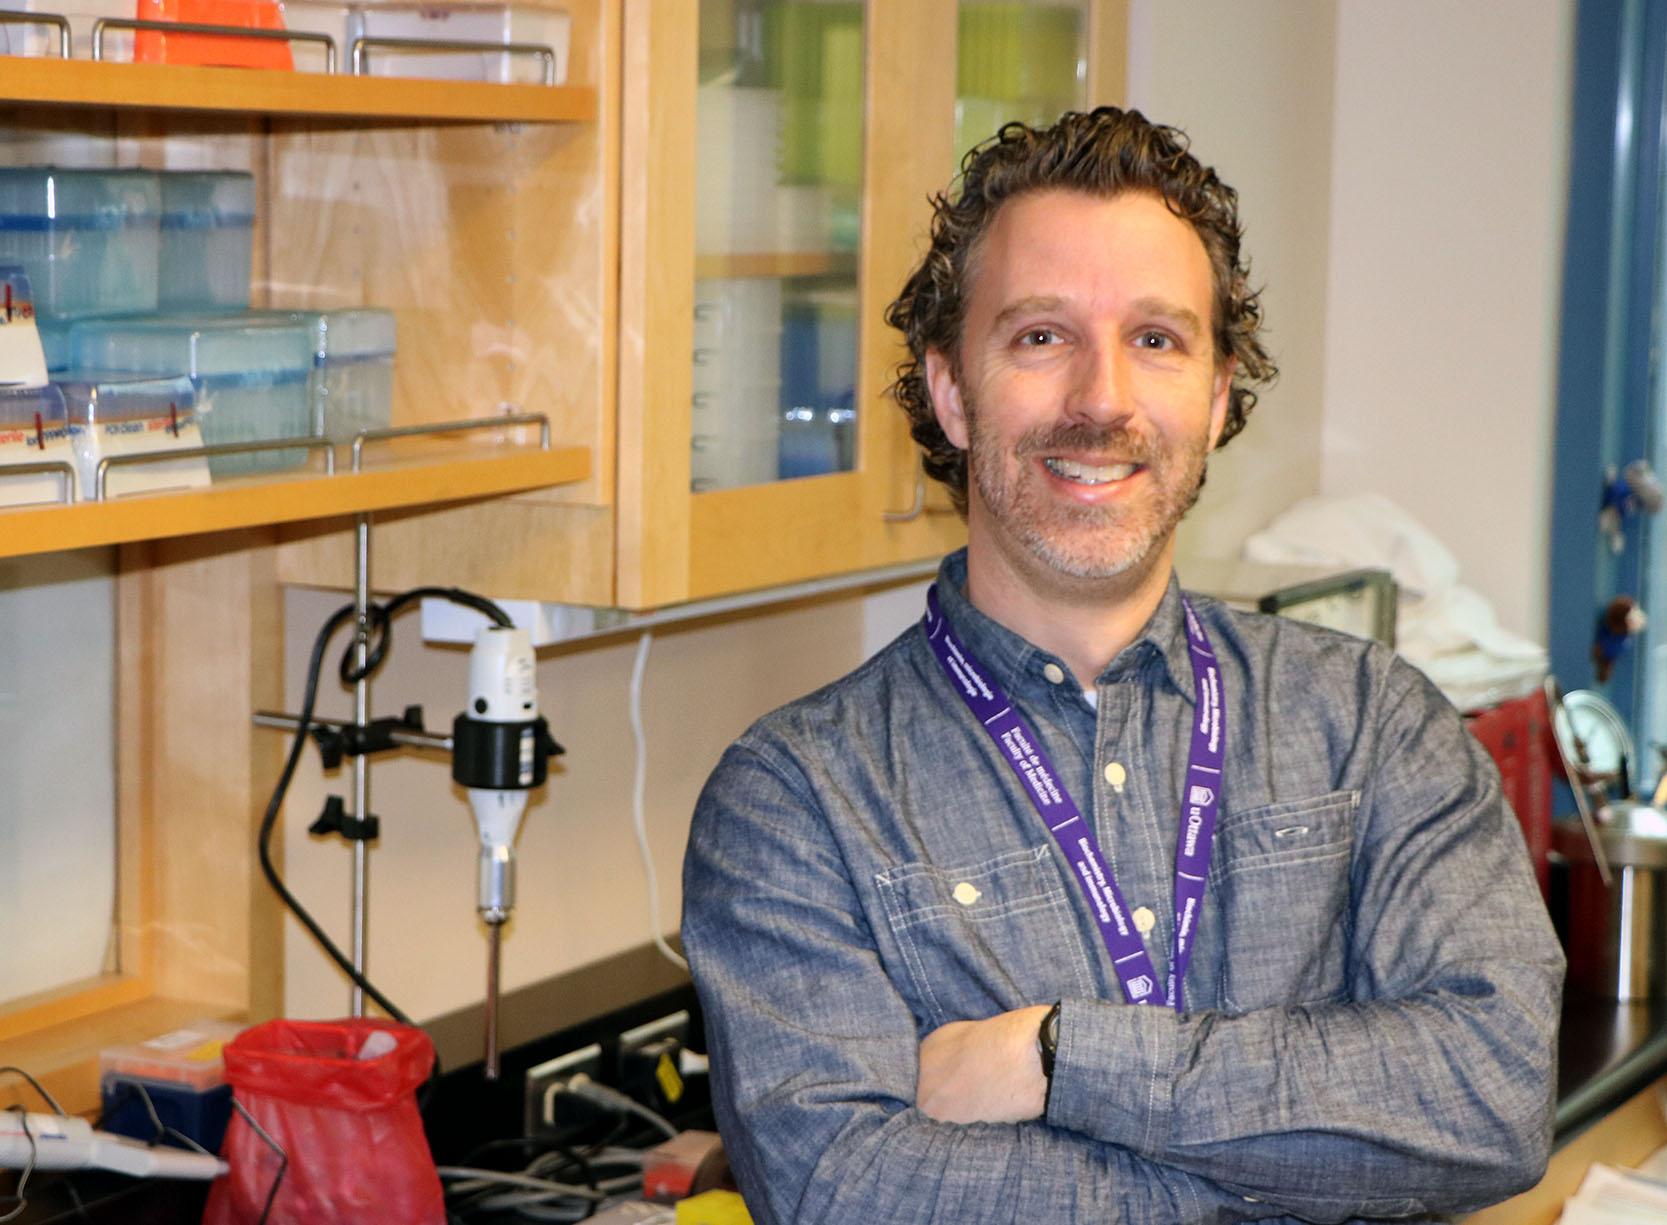 Dr. Patrick Giguere